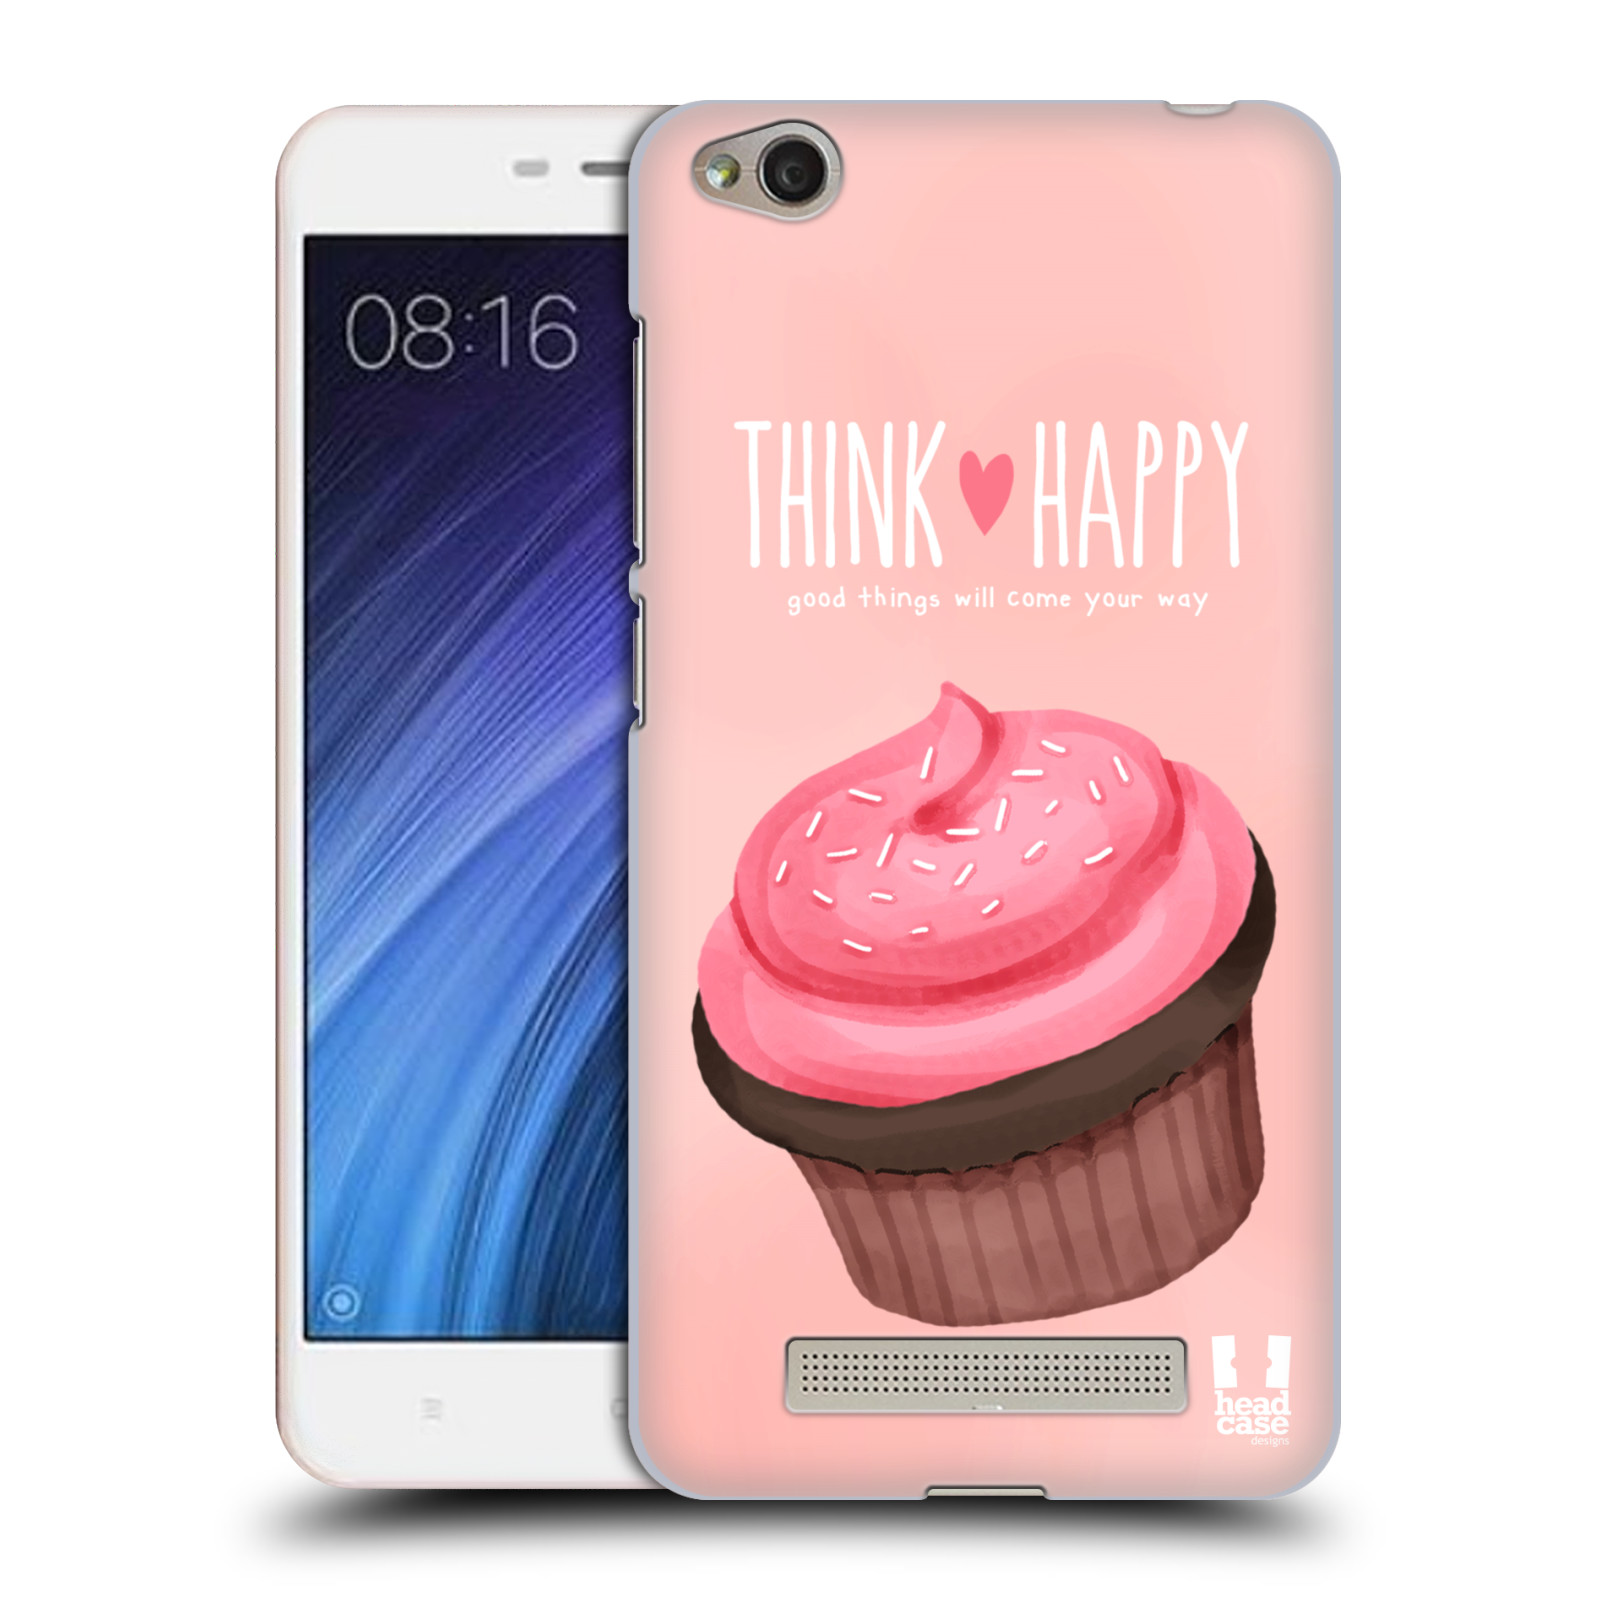 Plastové pouzdro na mobil Xiaomi Redmi 4A HEAD CASE CUPCAKE THINK HAPPY